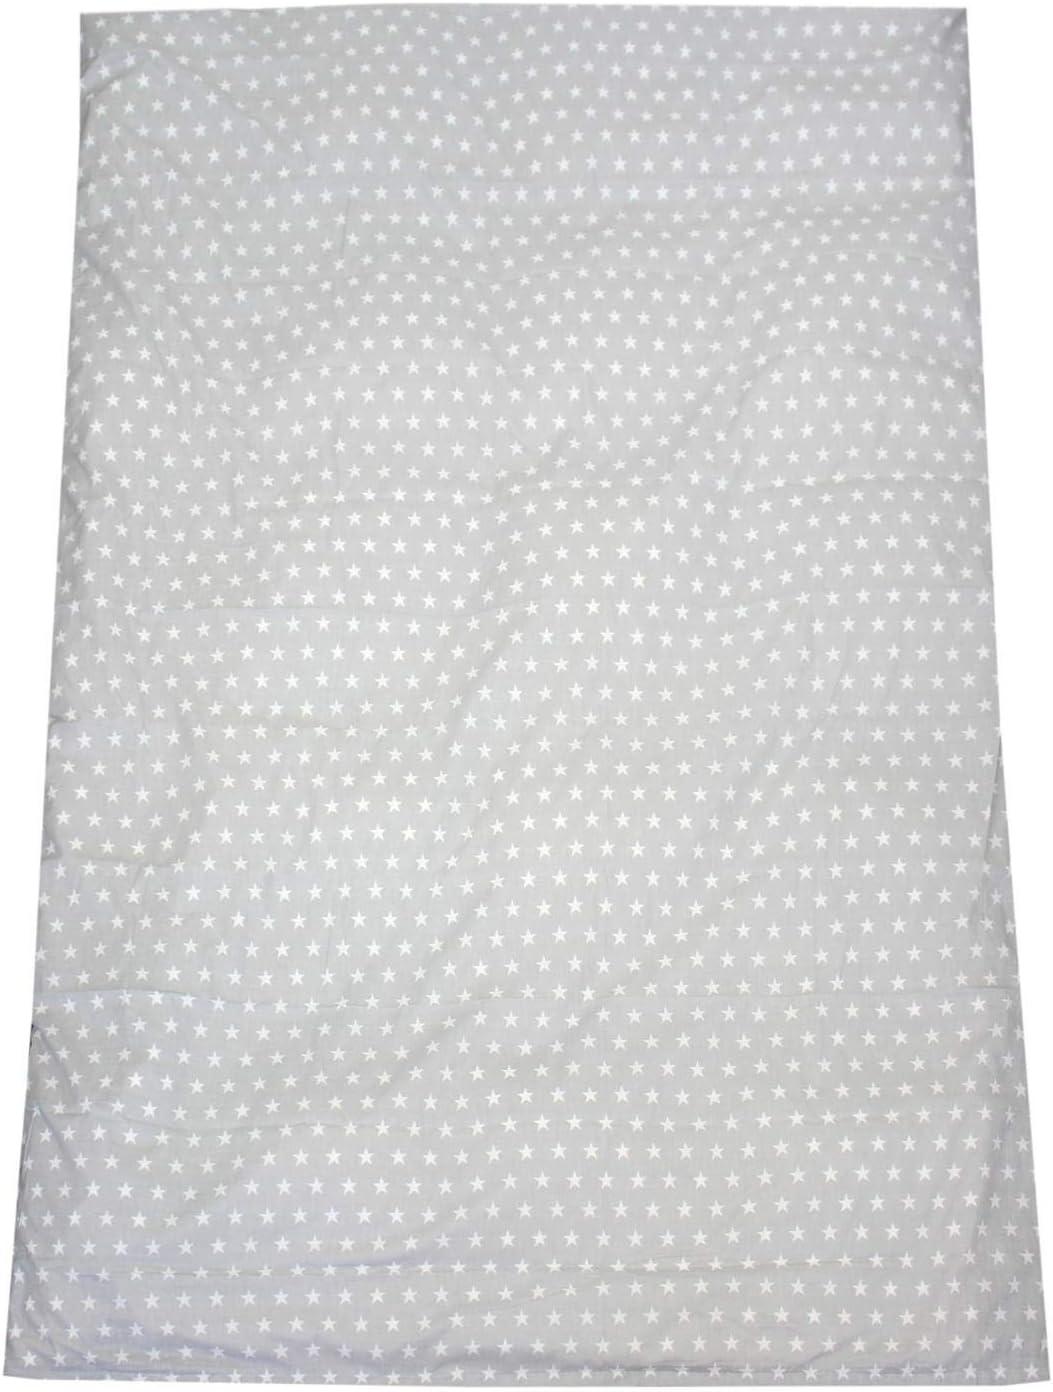 TupTam Childrens Pillow Case with Decorative Patterns Drops Turquoise 30 x 50 cm